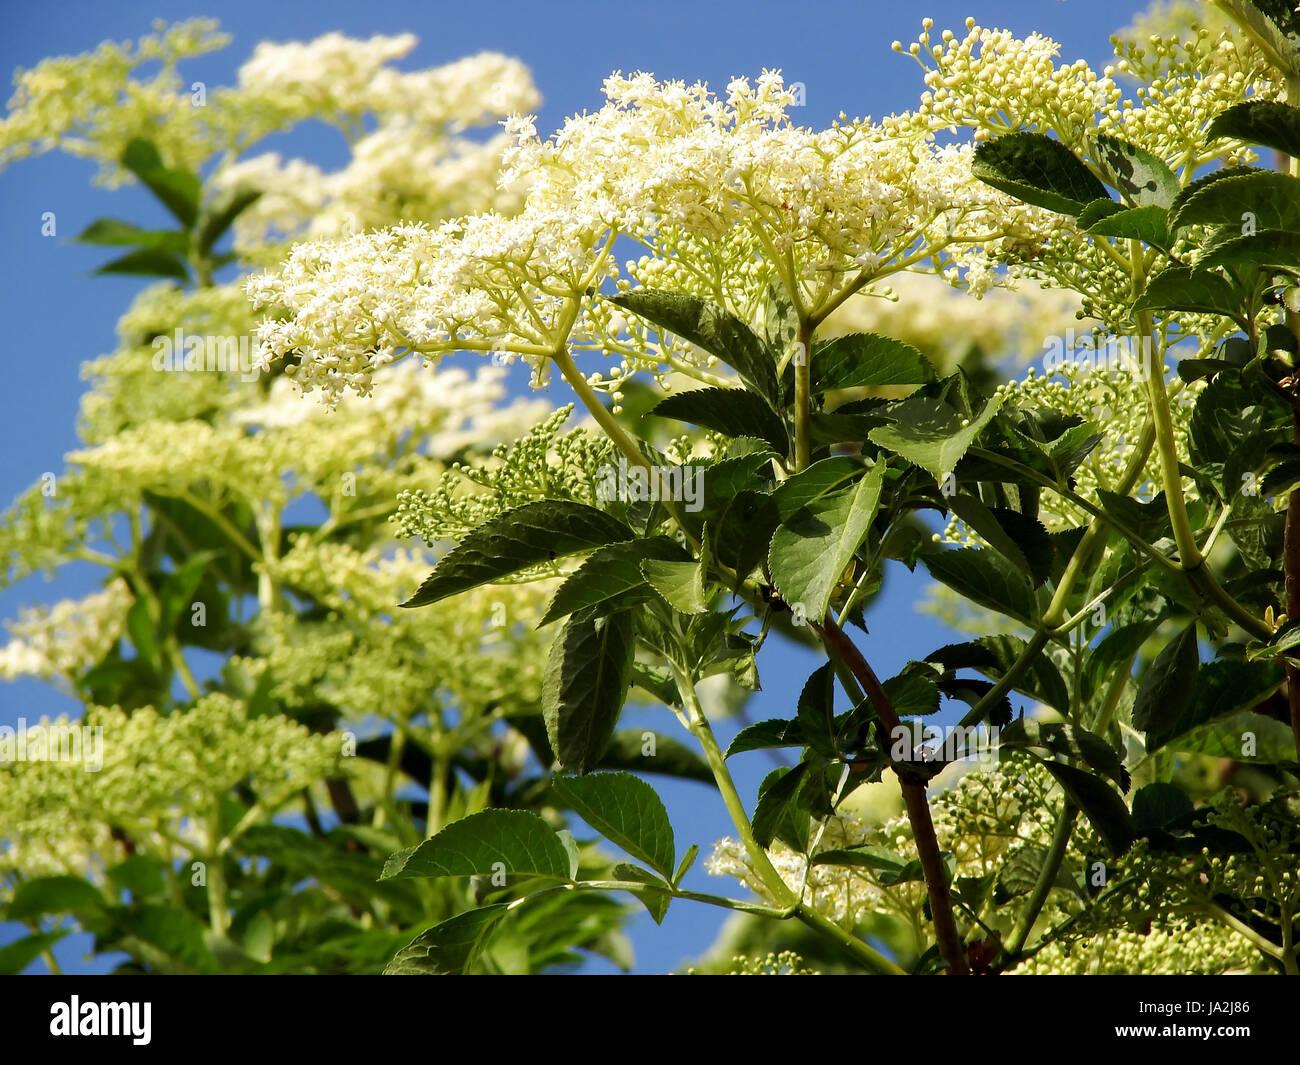 health, medicinally, medical, bloom, blossom, flourish, flourishing, bush, Stock Photo